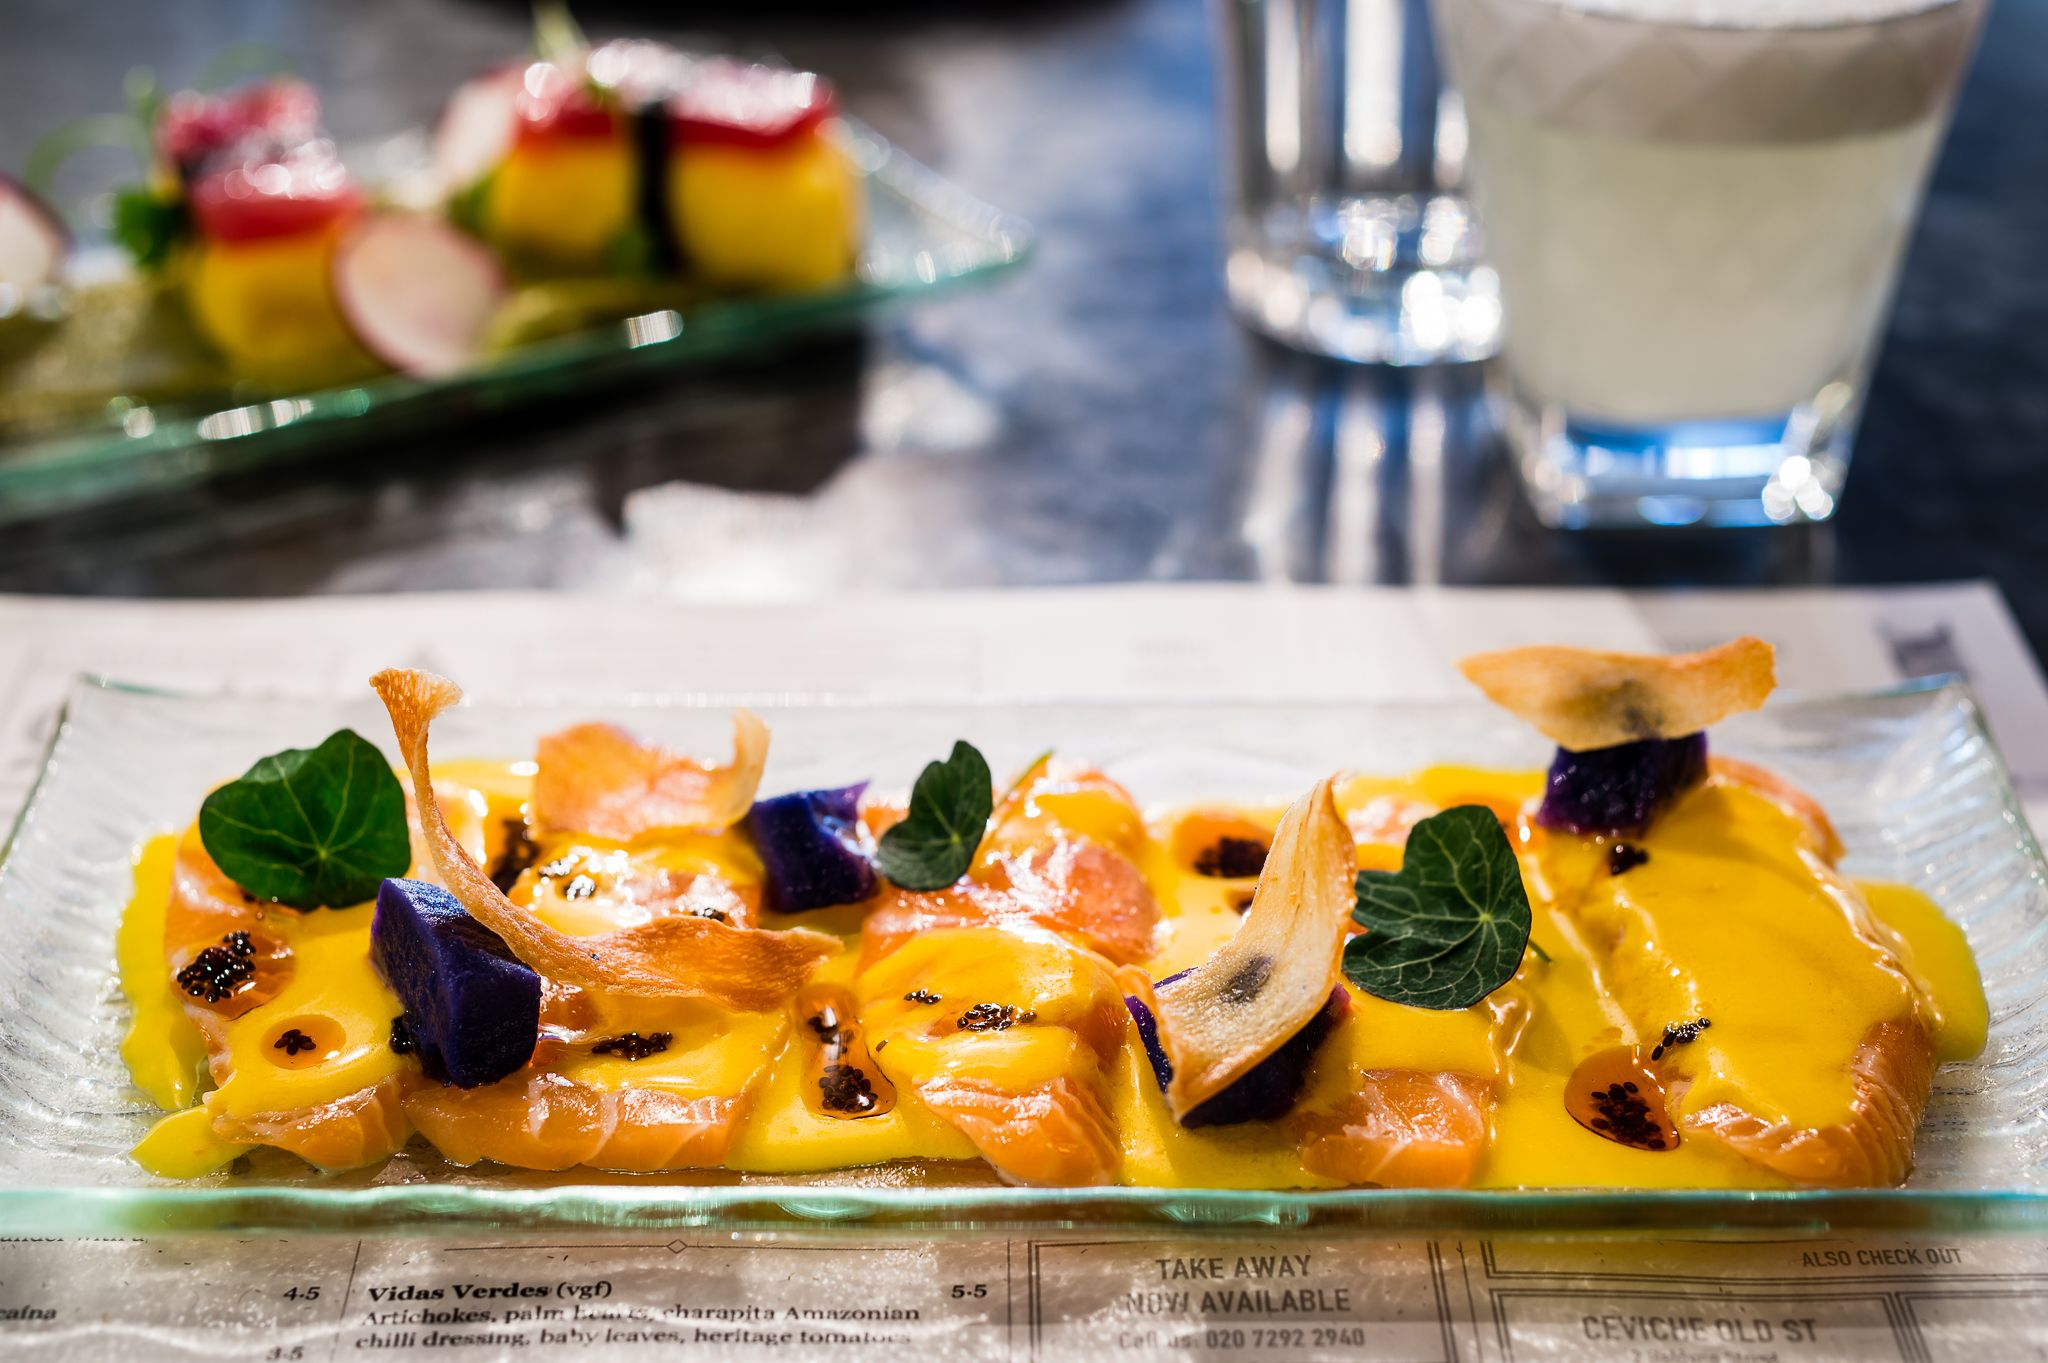 Tiradito Apasionado: Sustainable salmon, passion fruit tiger's milk, purple potato, chia seeds, cassava crisps, nasturtium leaves